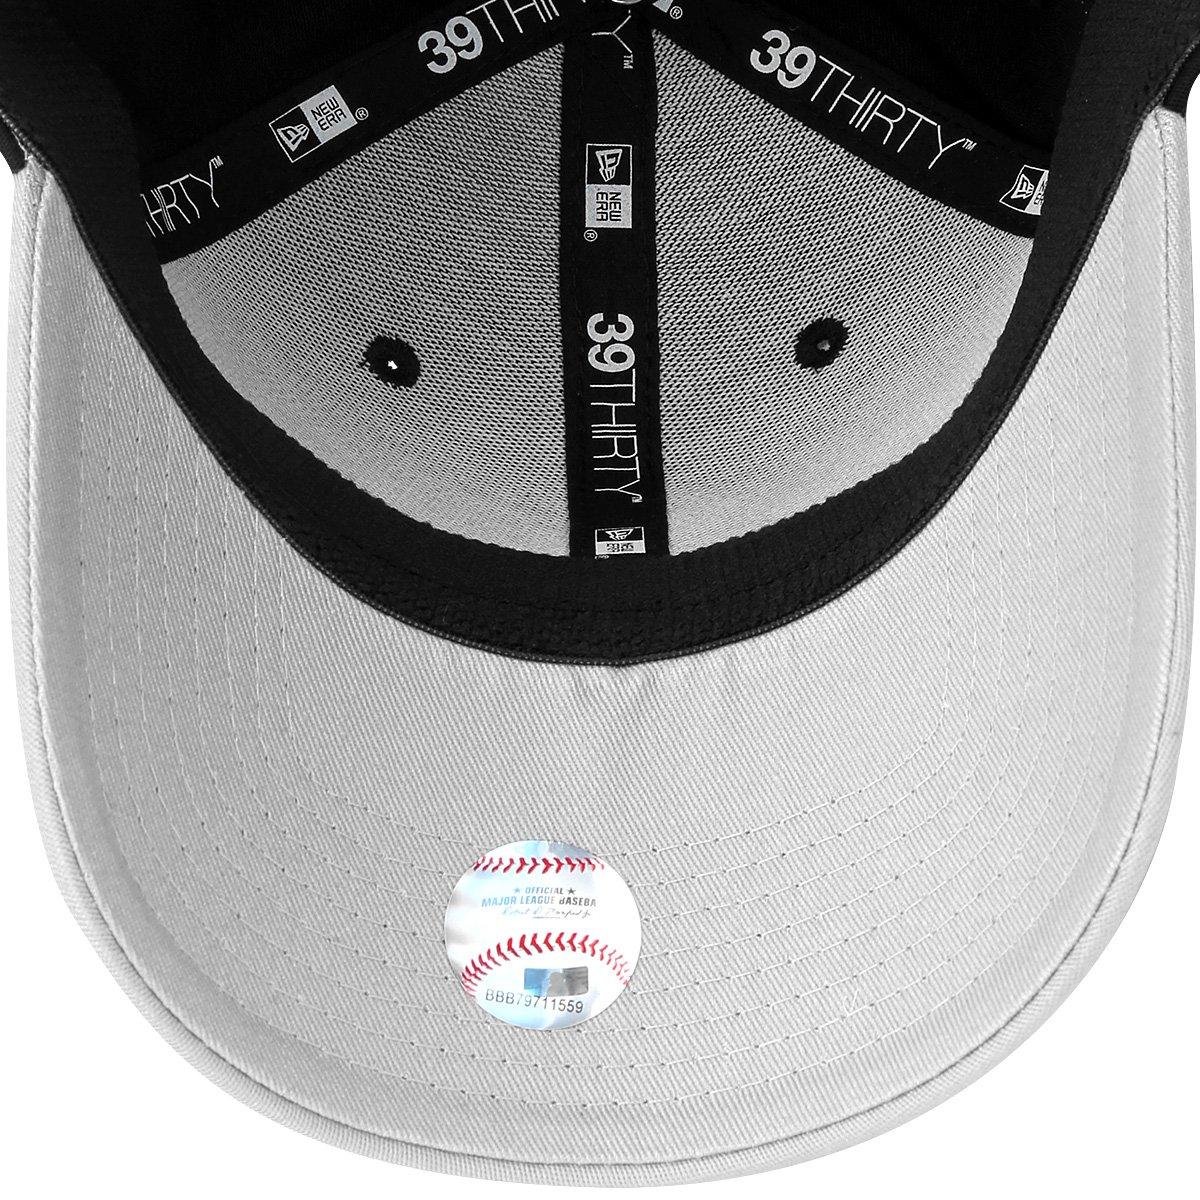 Boné New Era MLB 3930 Hc Basic Chicago White Sox Otc - Compre Agora ... 5f09cbecef0